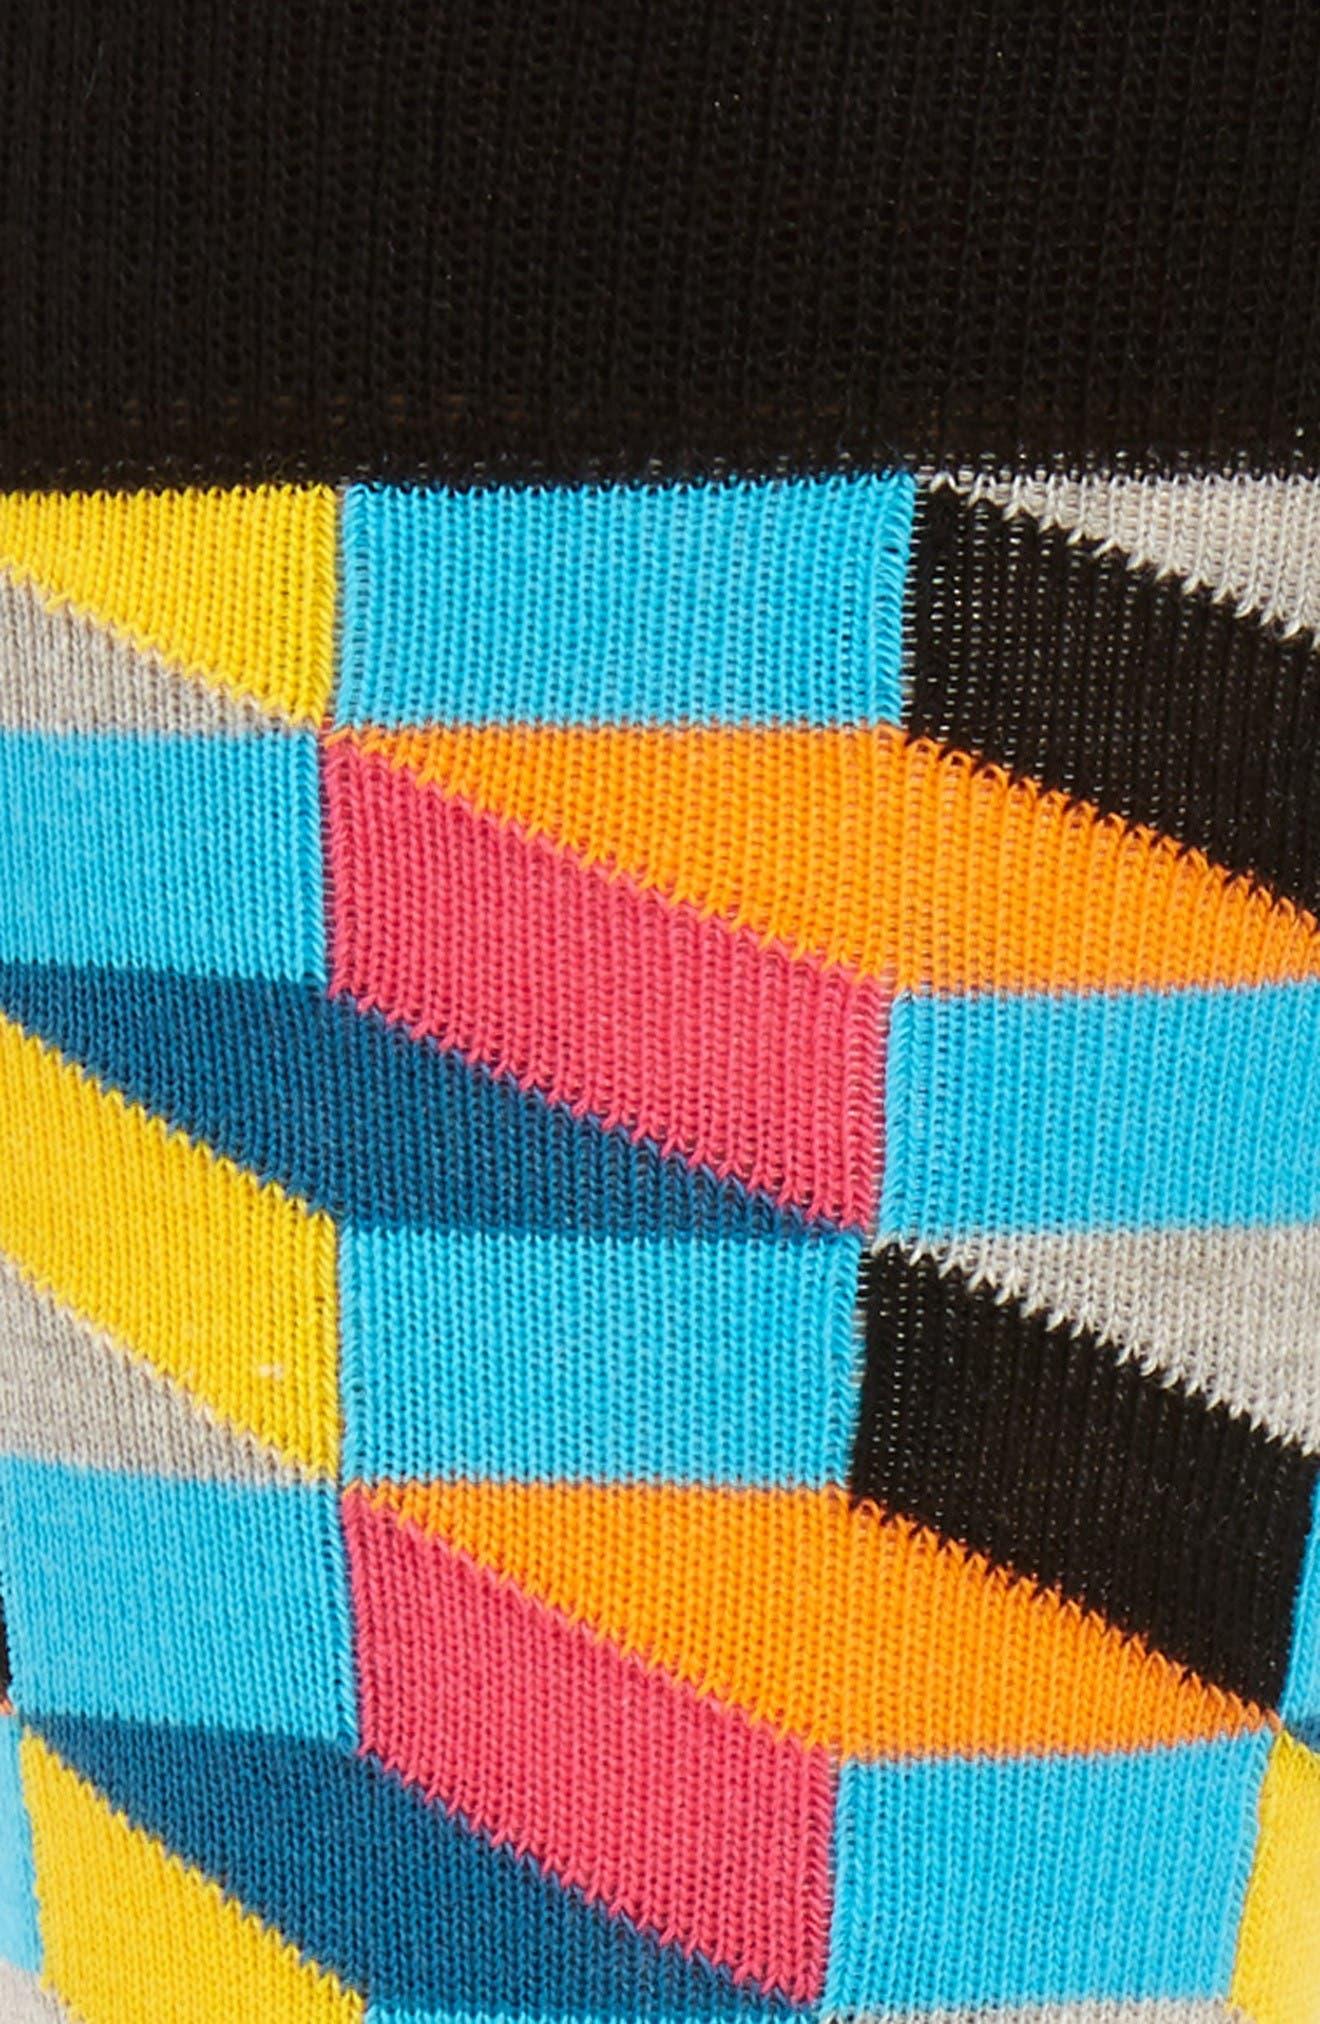 Geometric Cotton Blend Socks,                             Alternate thumbnail 2, color,                             Blue/ Yellow